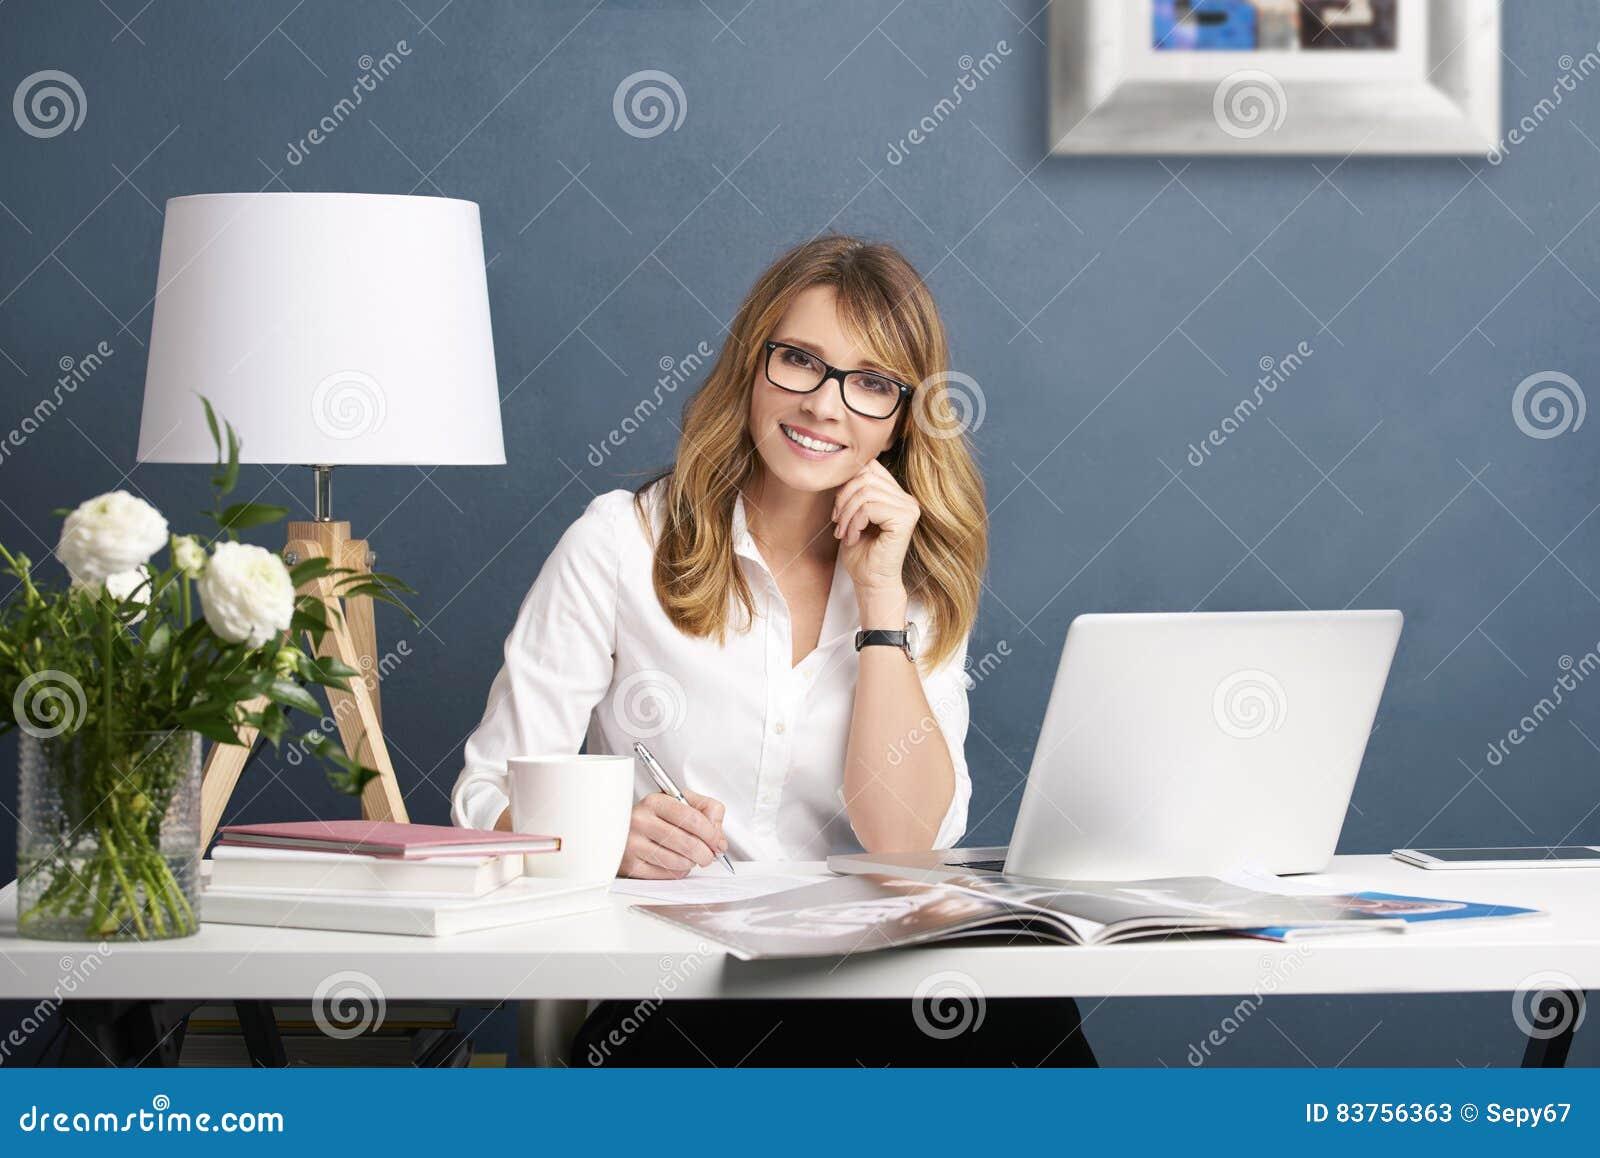 Fashion editor businesswoman